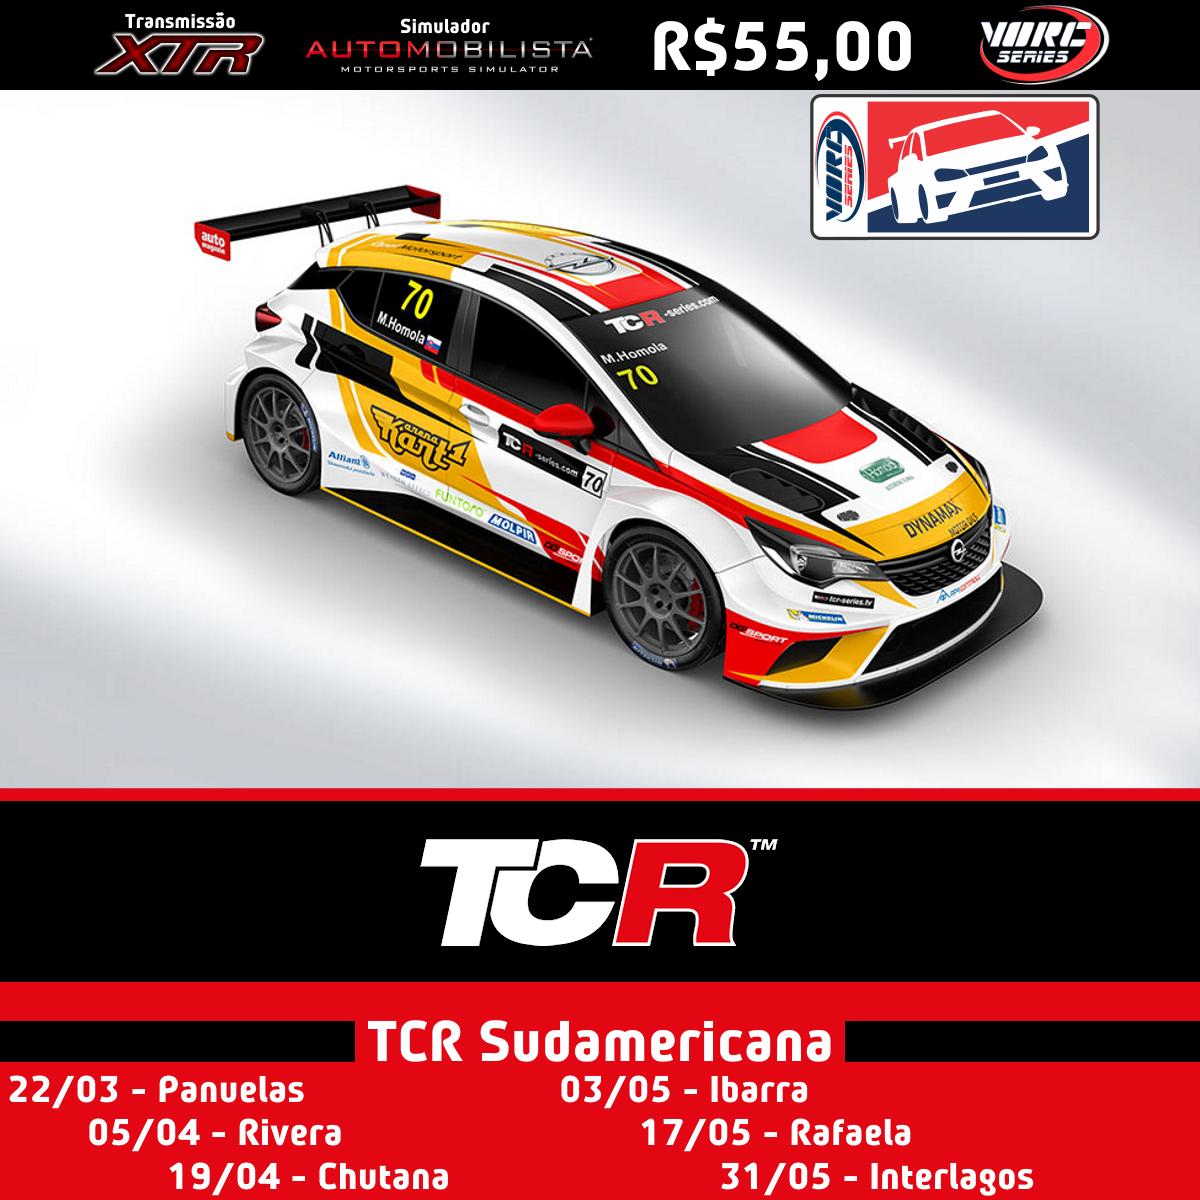 TCR Sudamericana